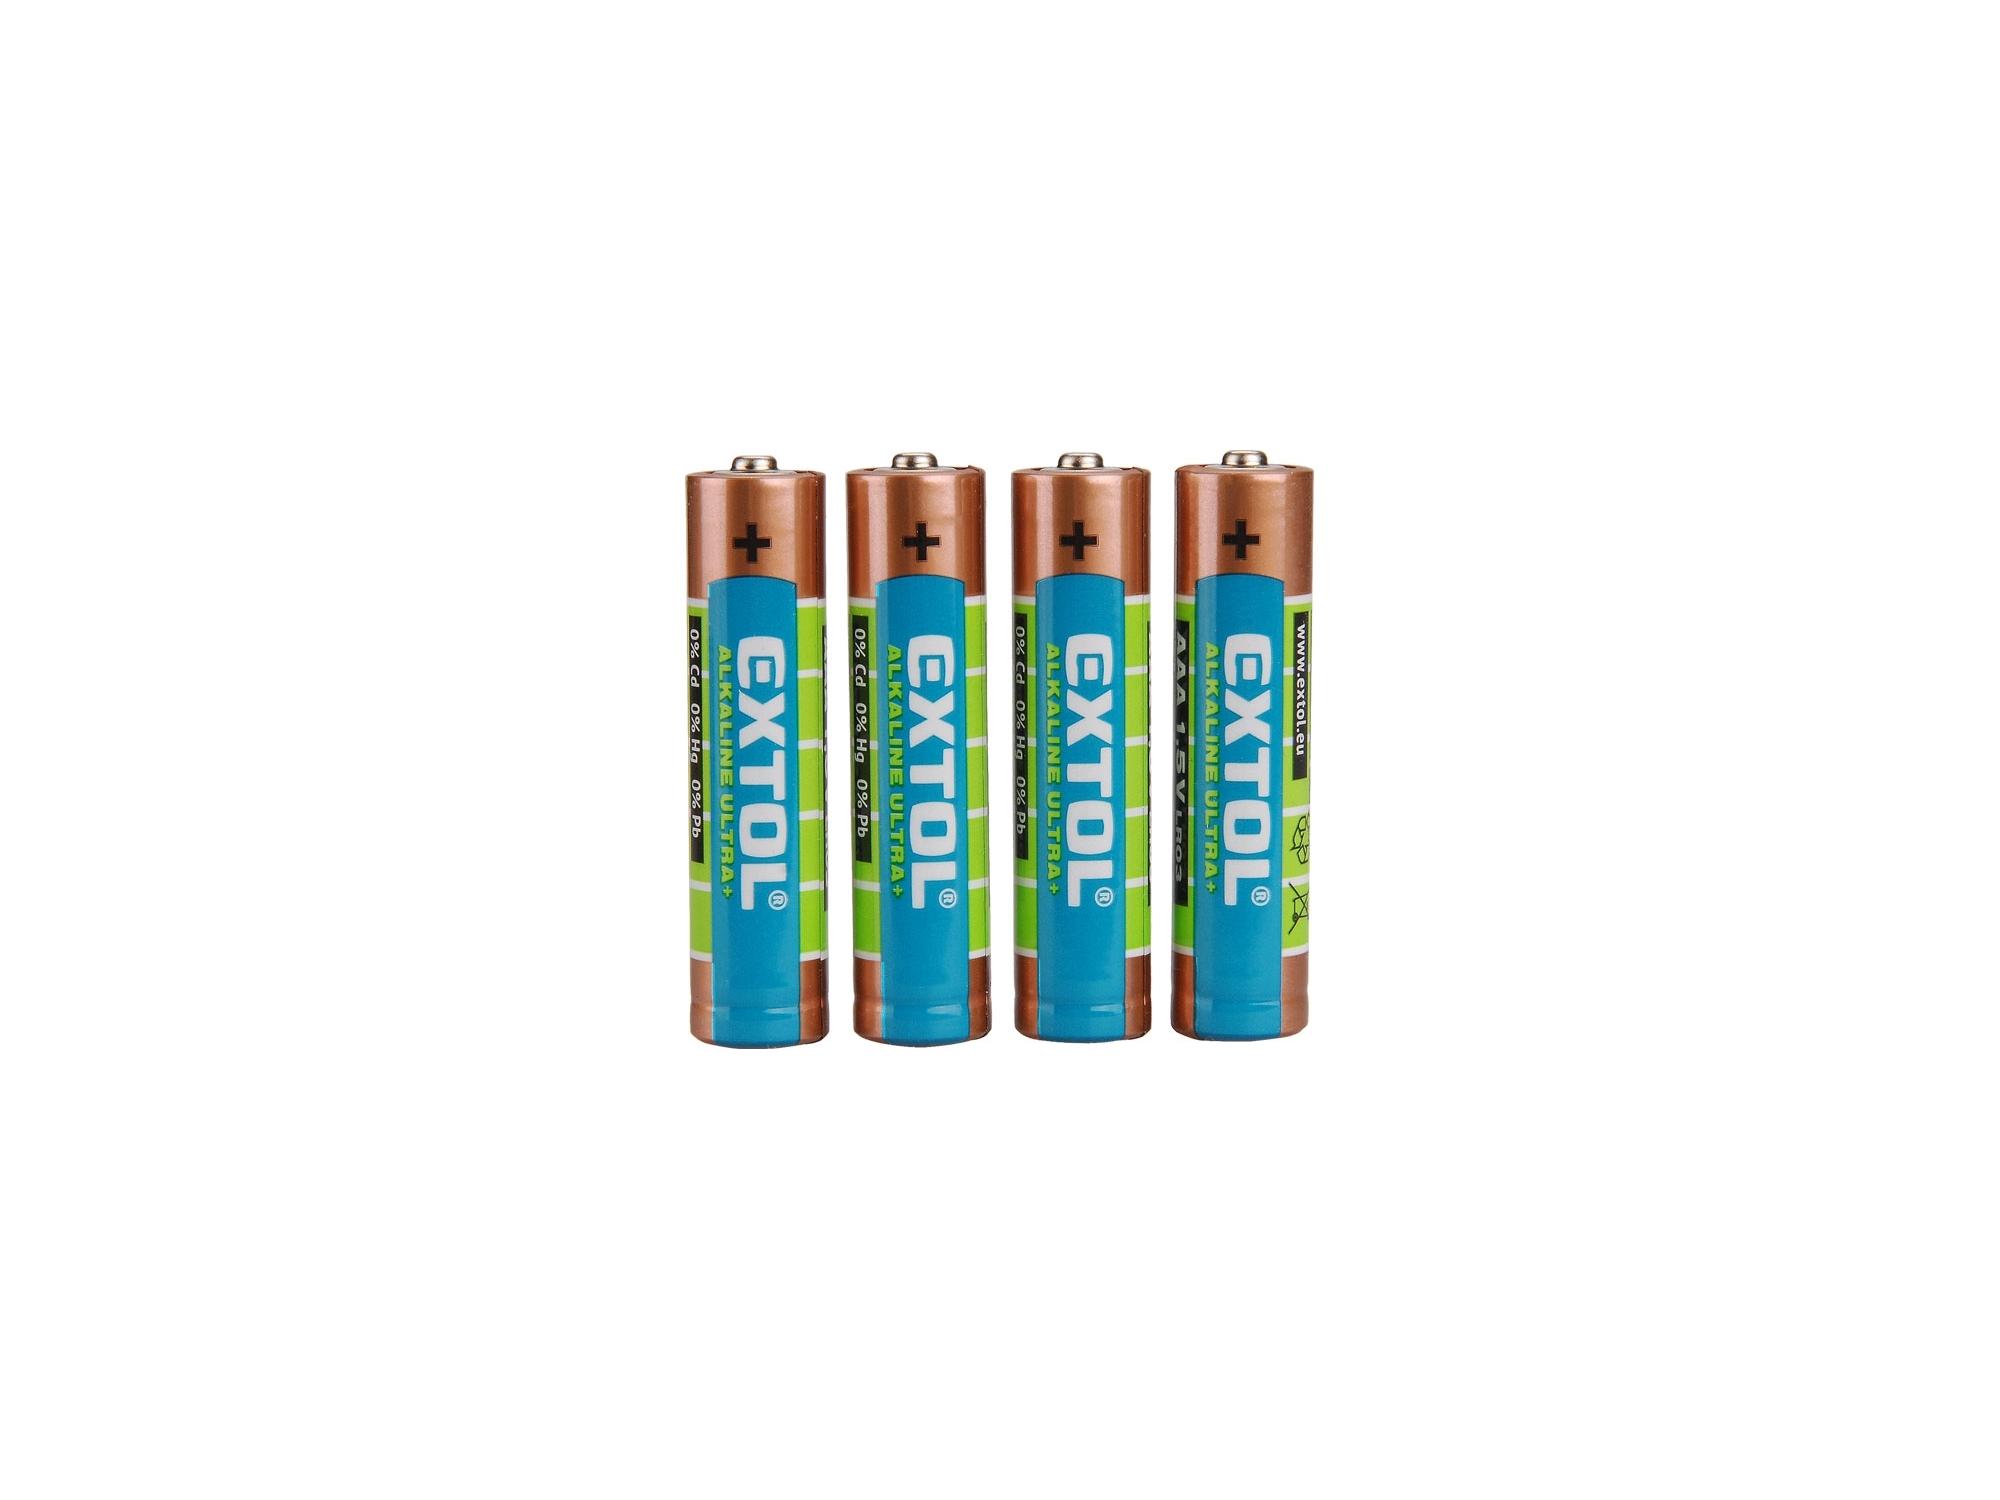 baterie alkalické, 4ks, 1,5V AAA (LR03), EXTOL ENERGY 42010